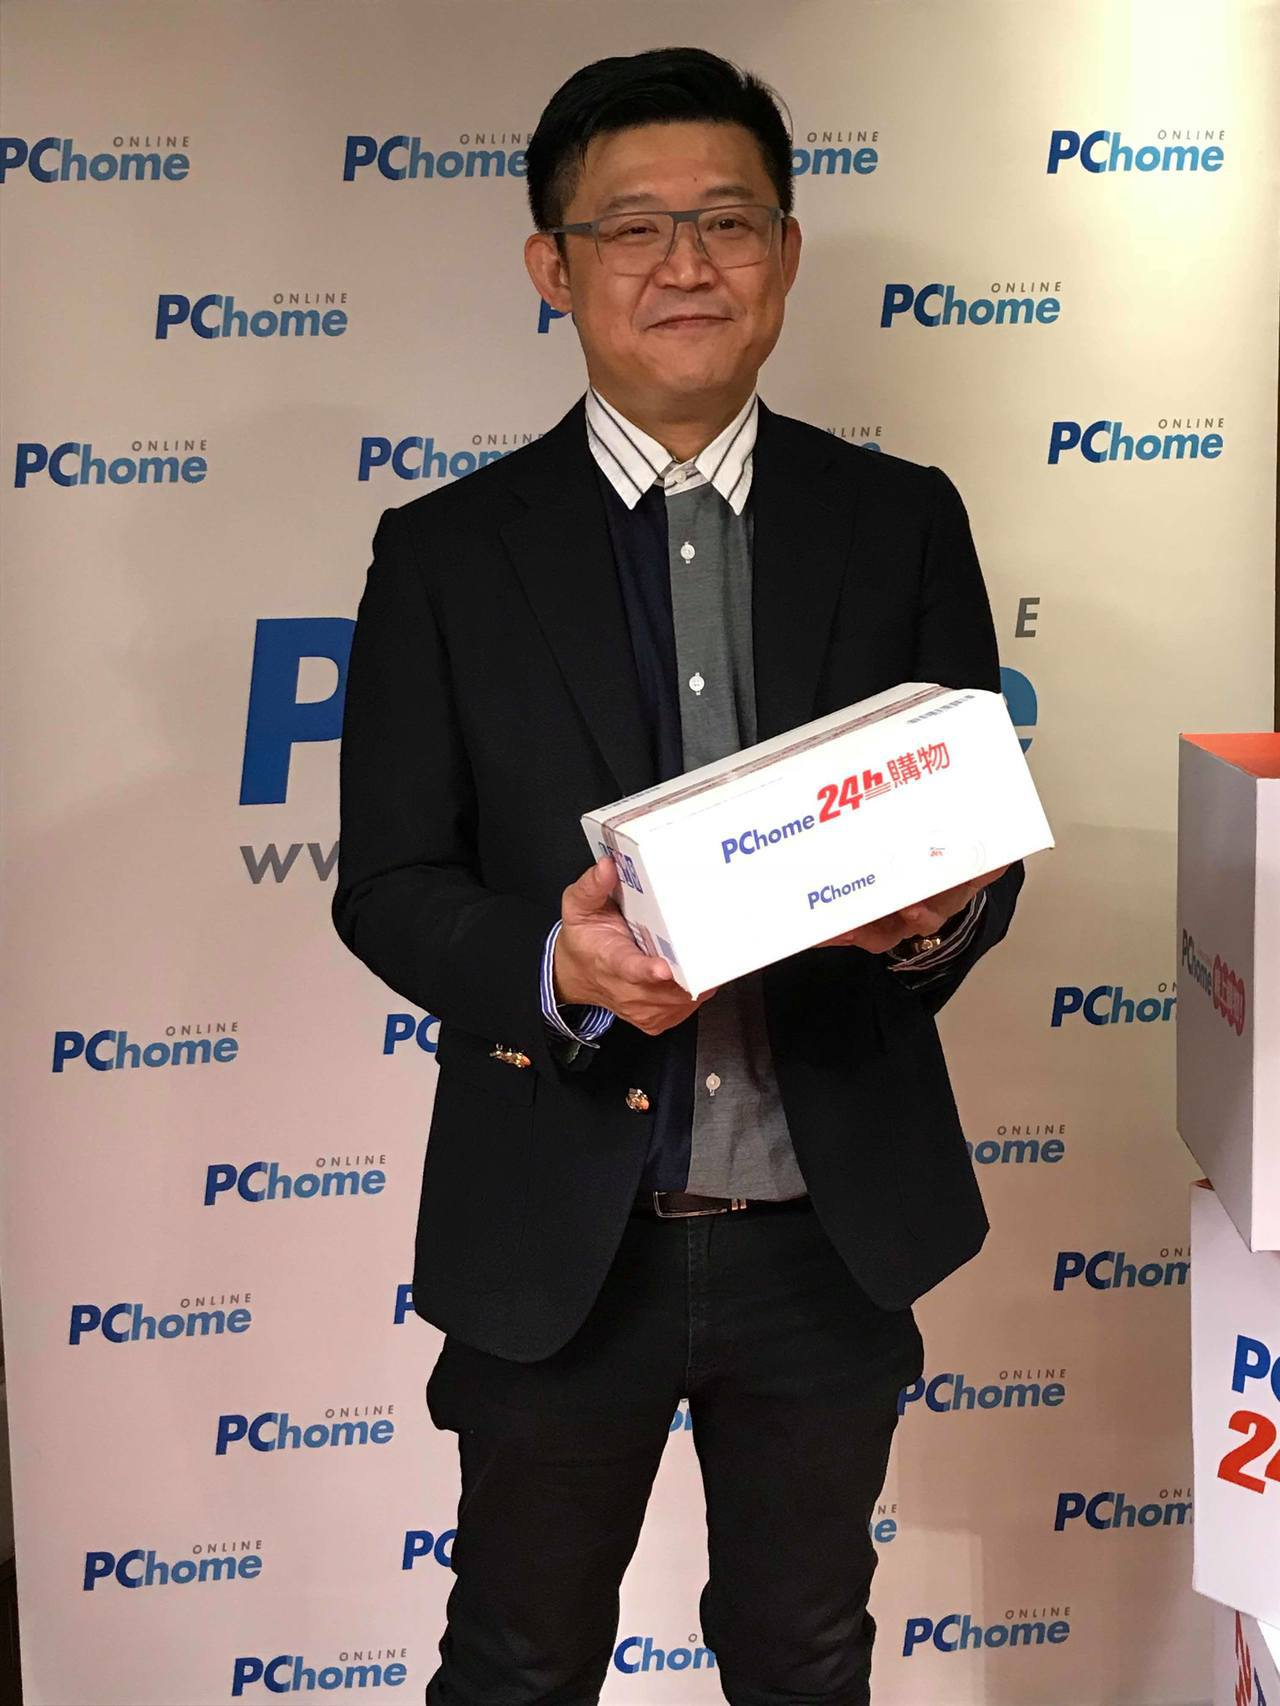 PChome 24h購物總經理蔡凱文。聯合報系資料照片